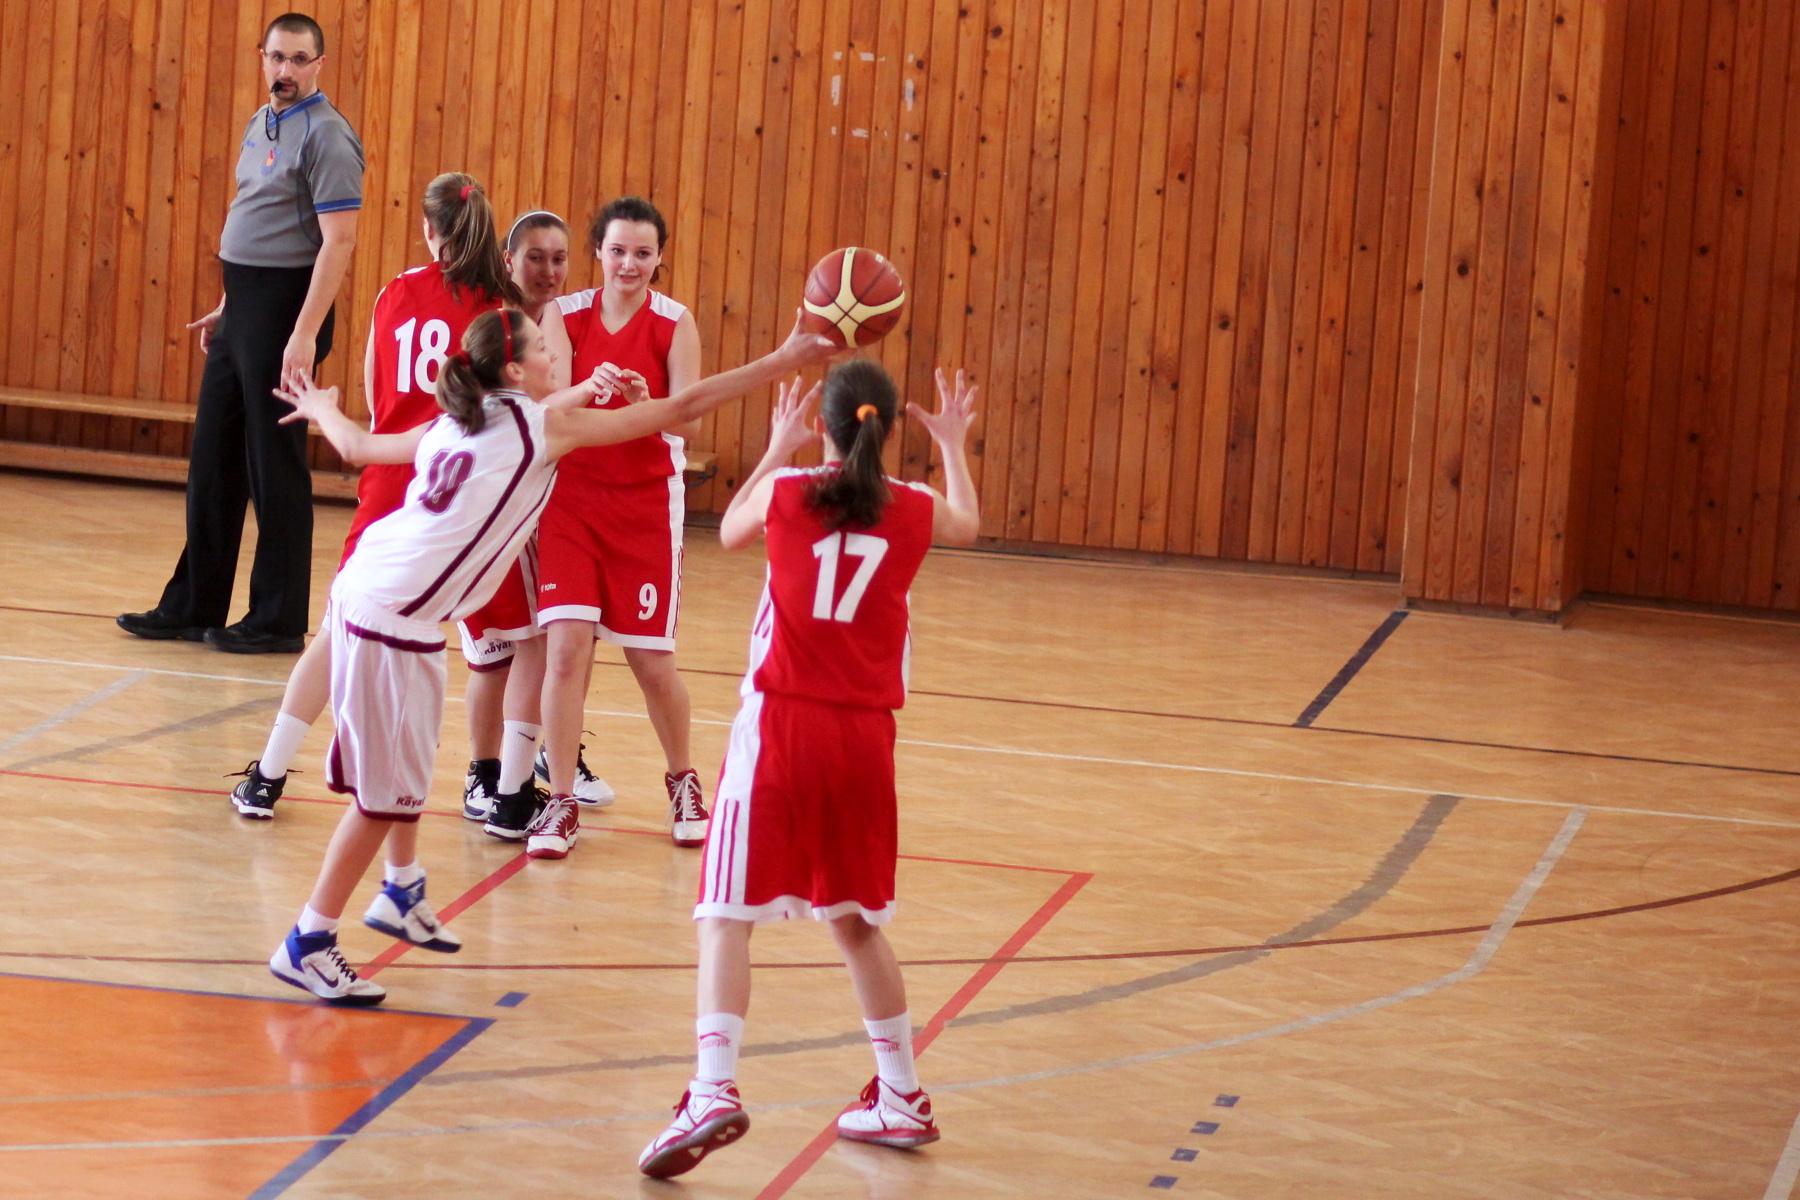 zvolen-bystrica-ziacky-basketbal-17